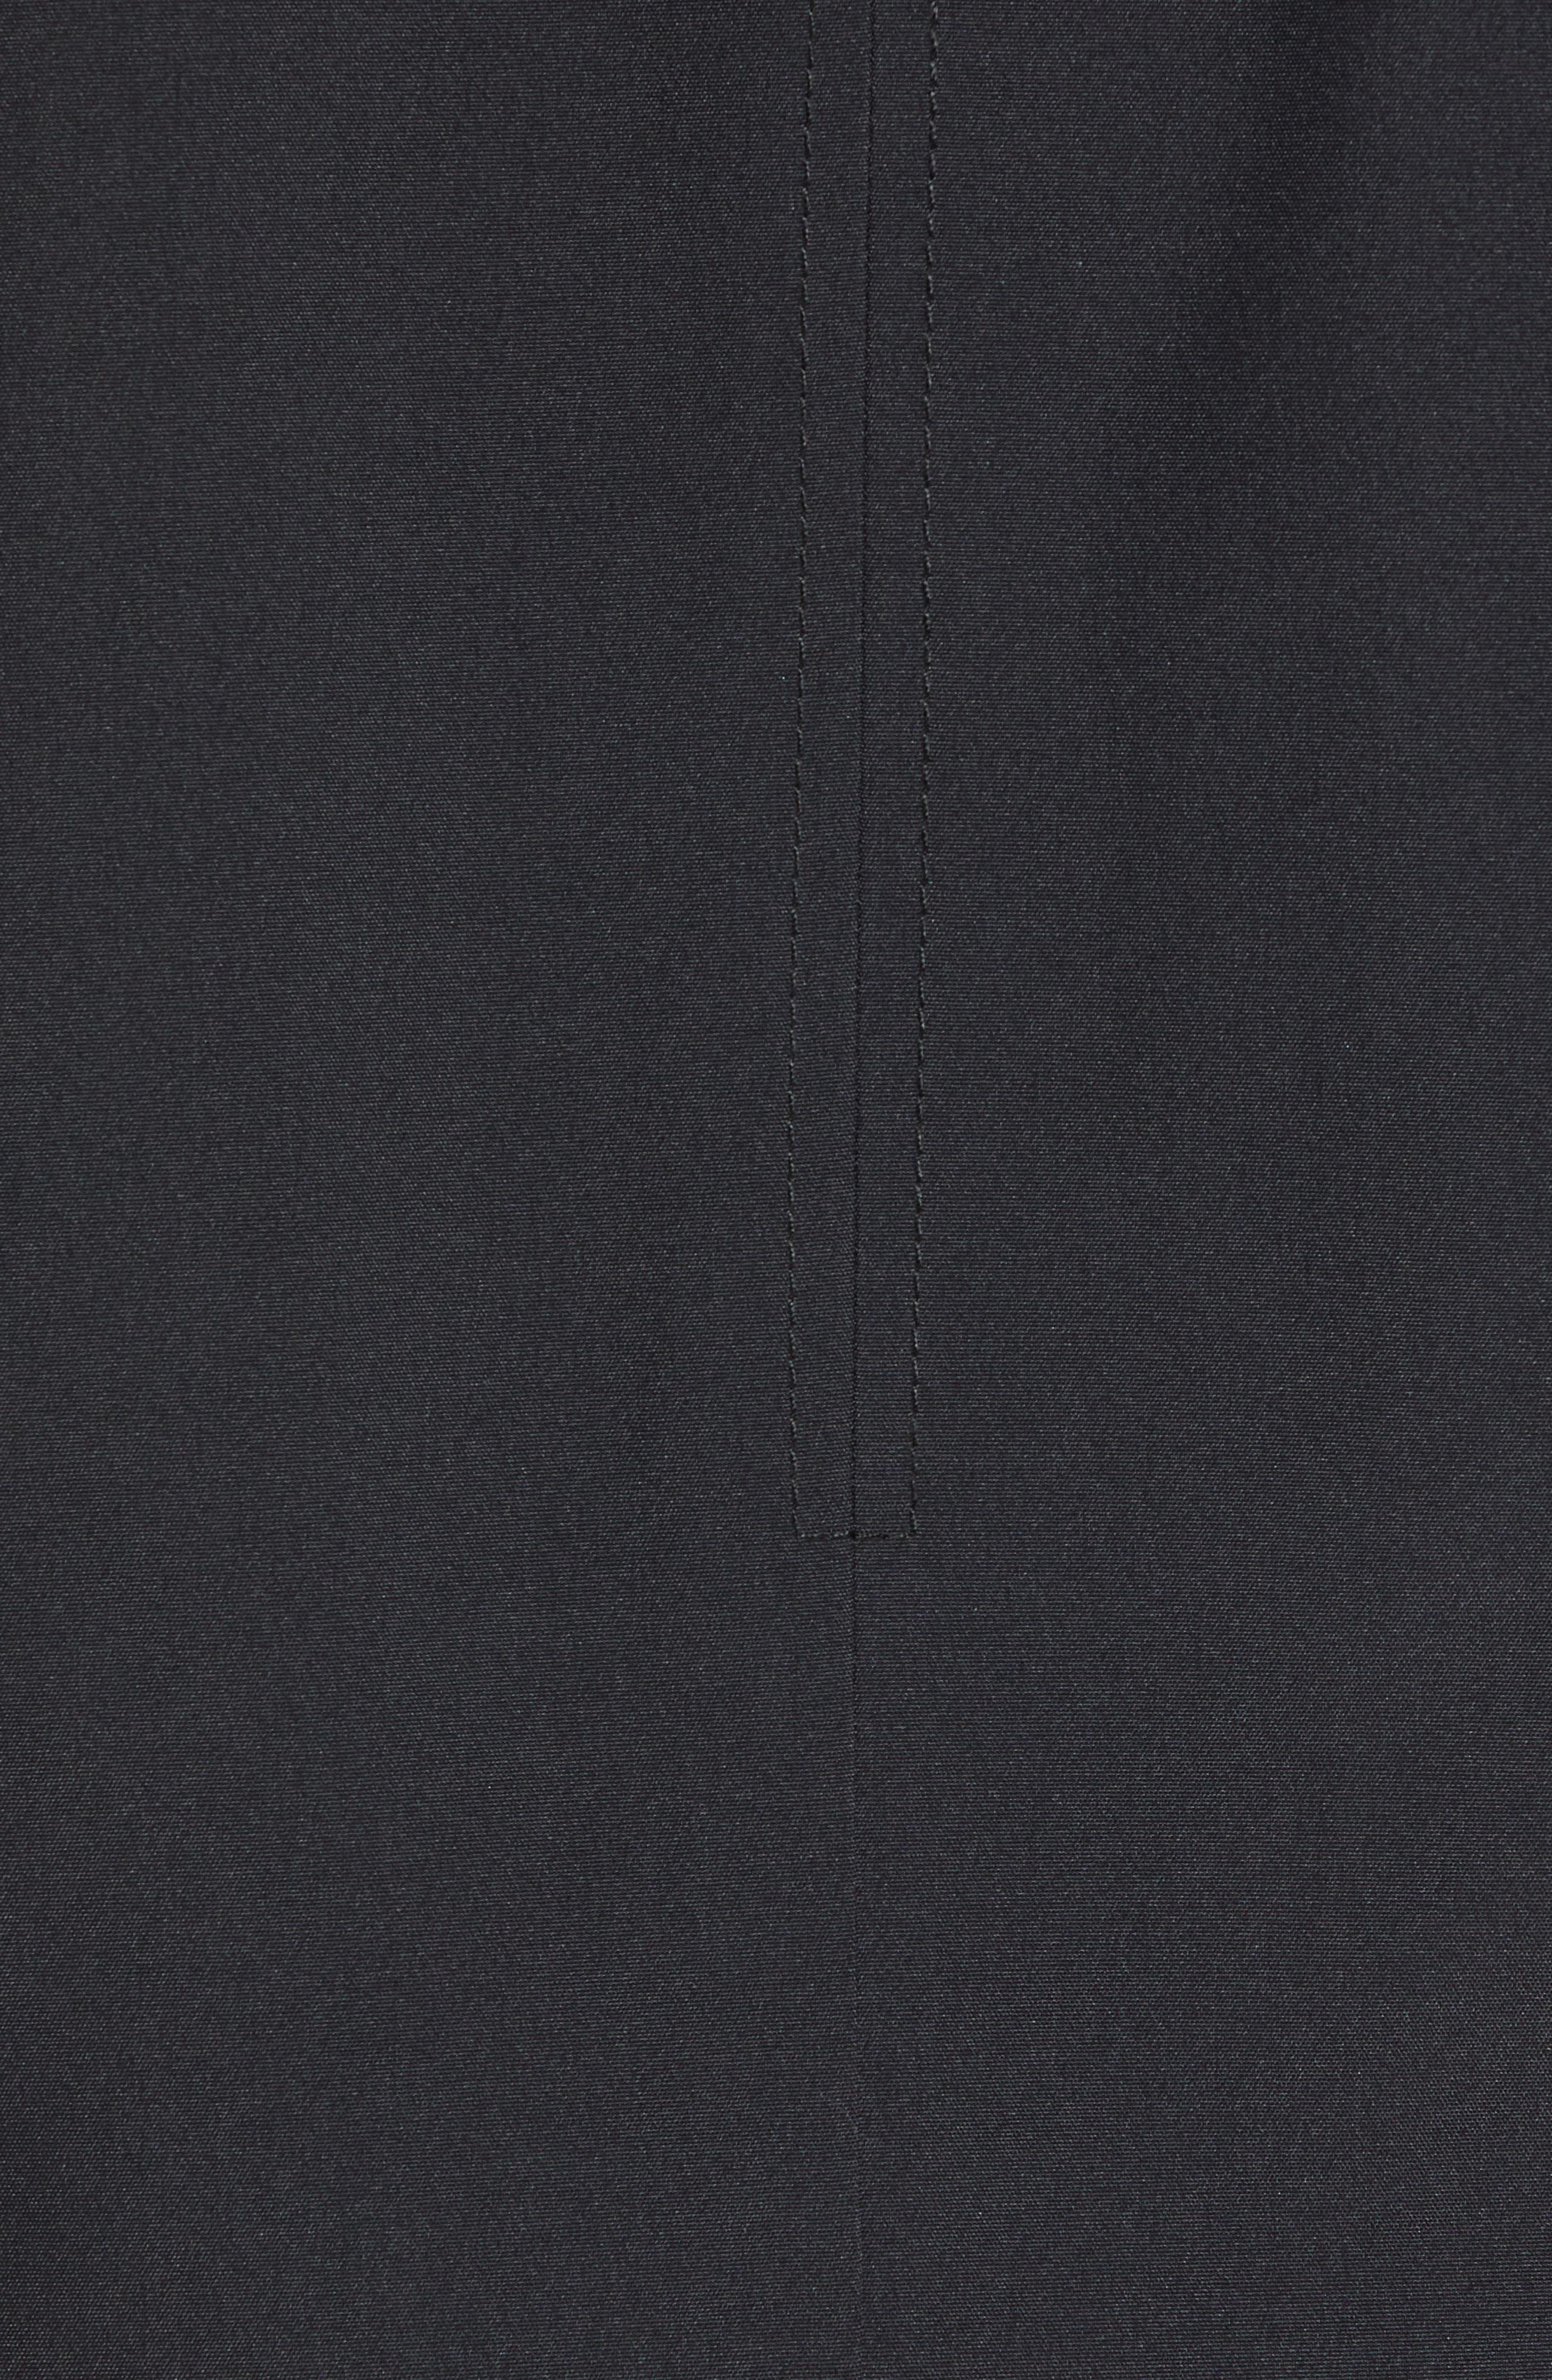 MARC NEW YORK, Cullen Oxford Car Coat, Alternate thumbnail 6, color, BLACK